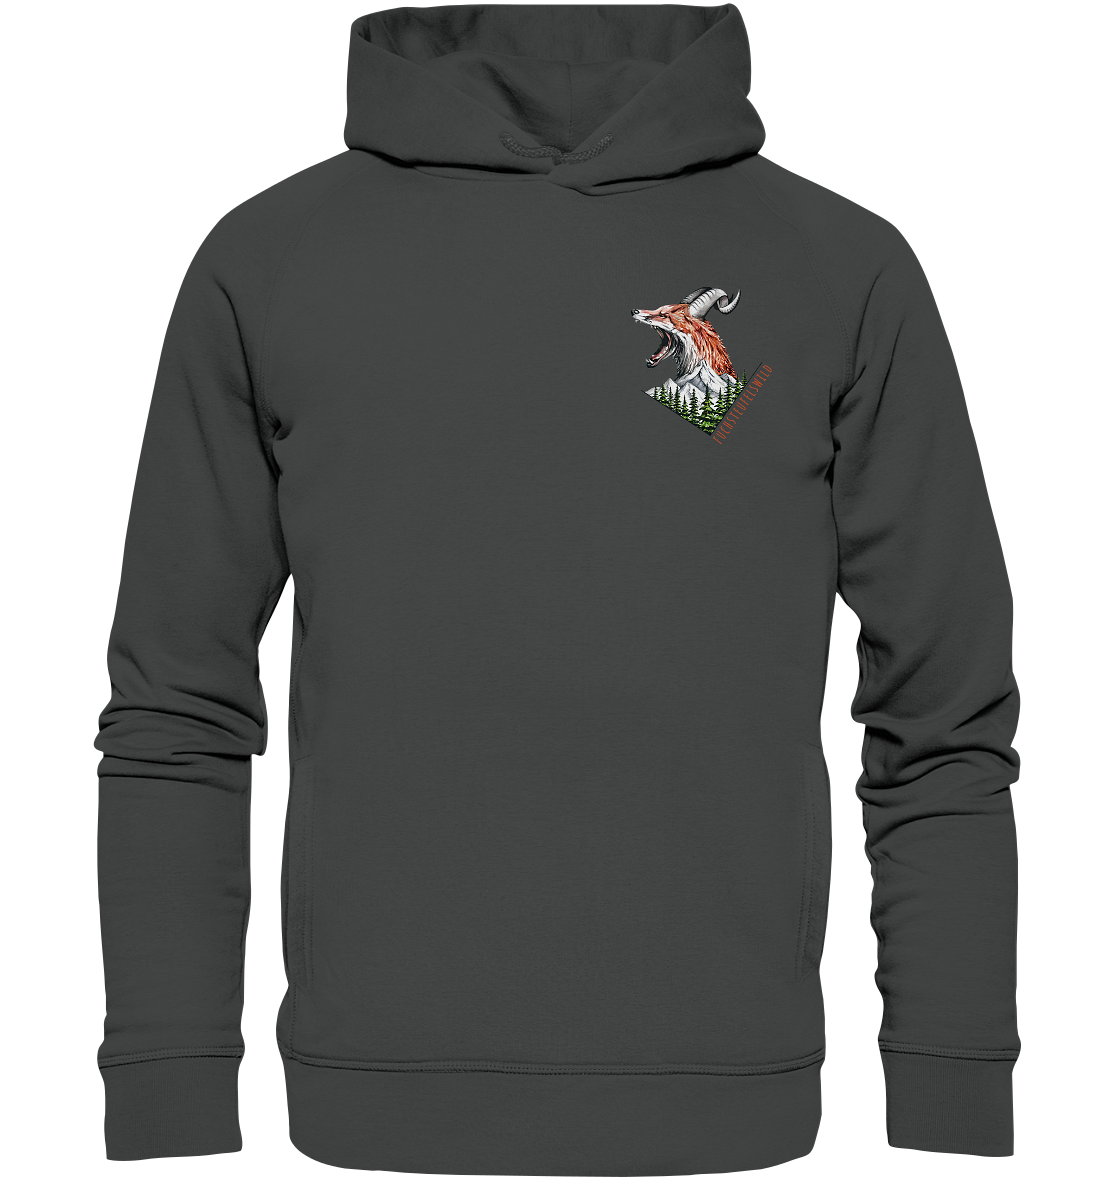 front-organic-fashion-hoodie-444545-1116x-1.png